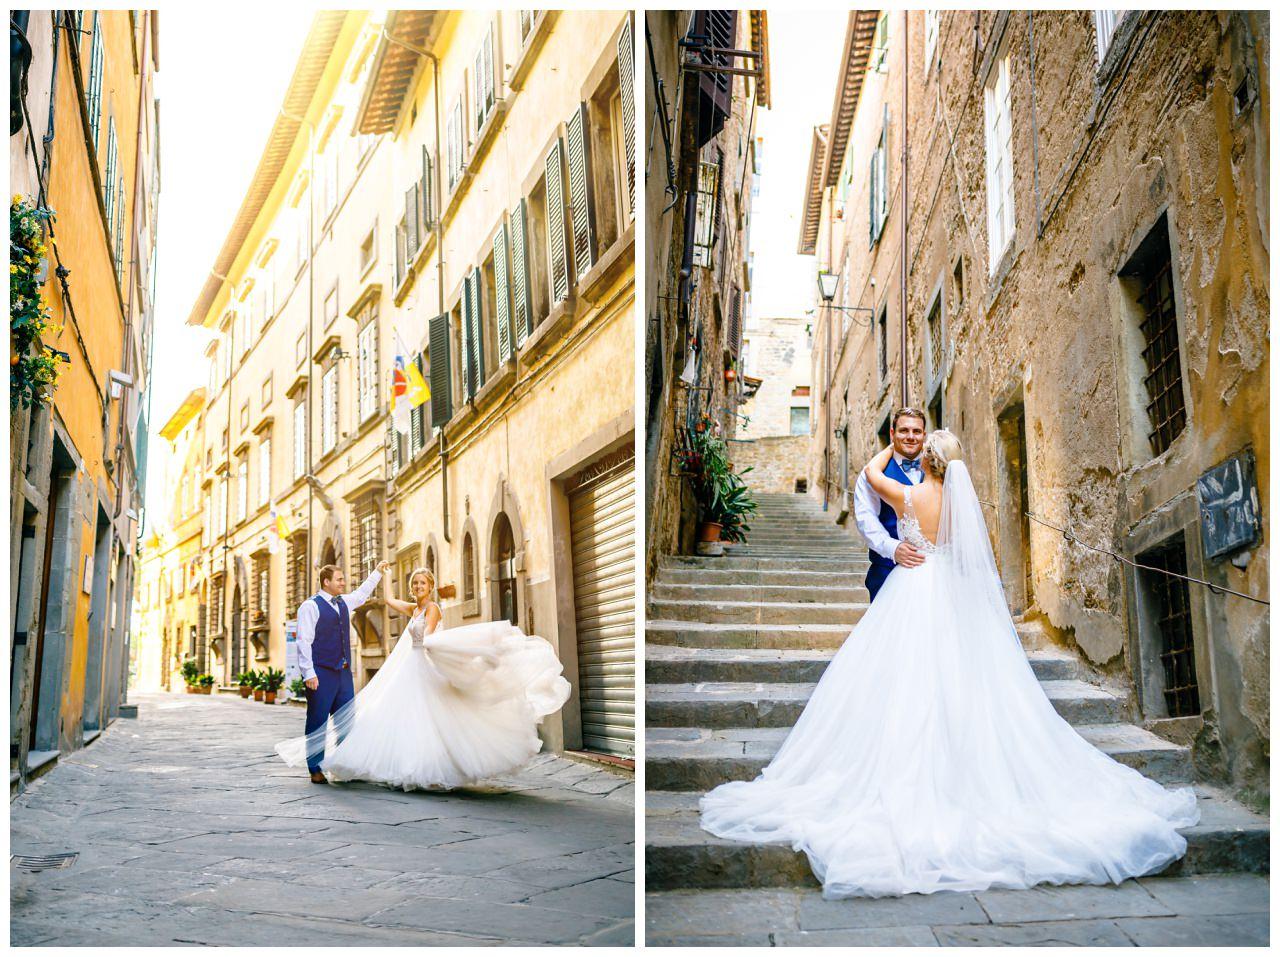 Hochzeitsfotos Toskana Fotograf After Wedding Shooting Italien 24 - After Wedding Shooting in der Toskana